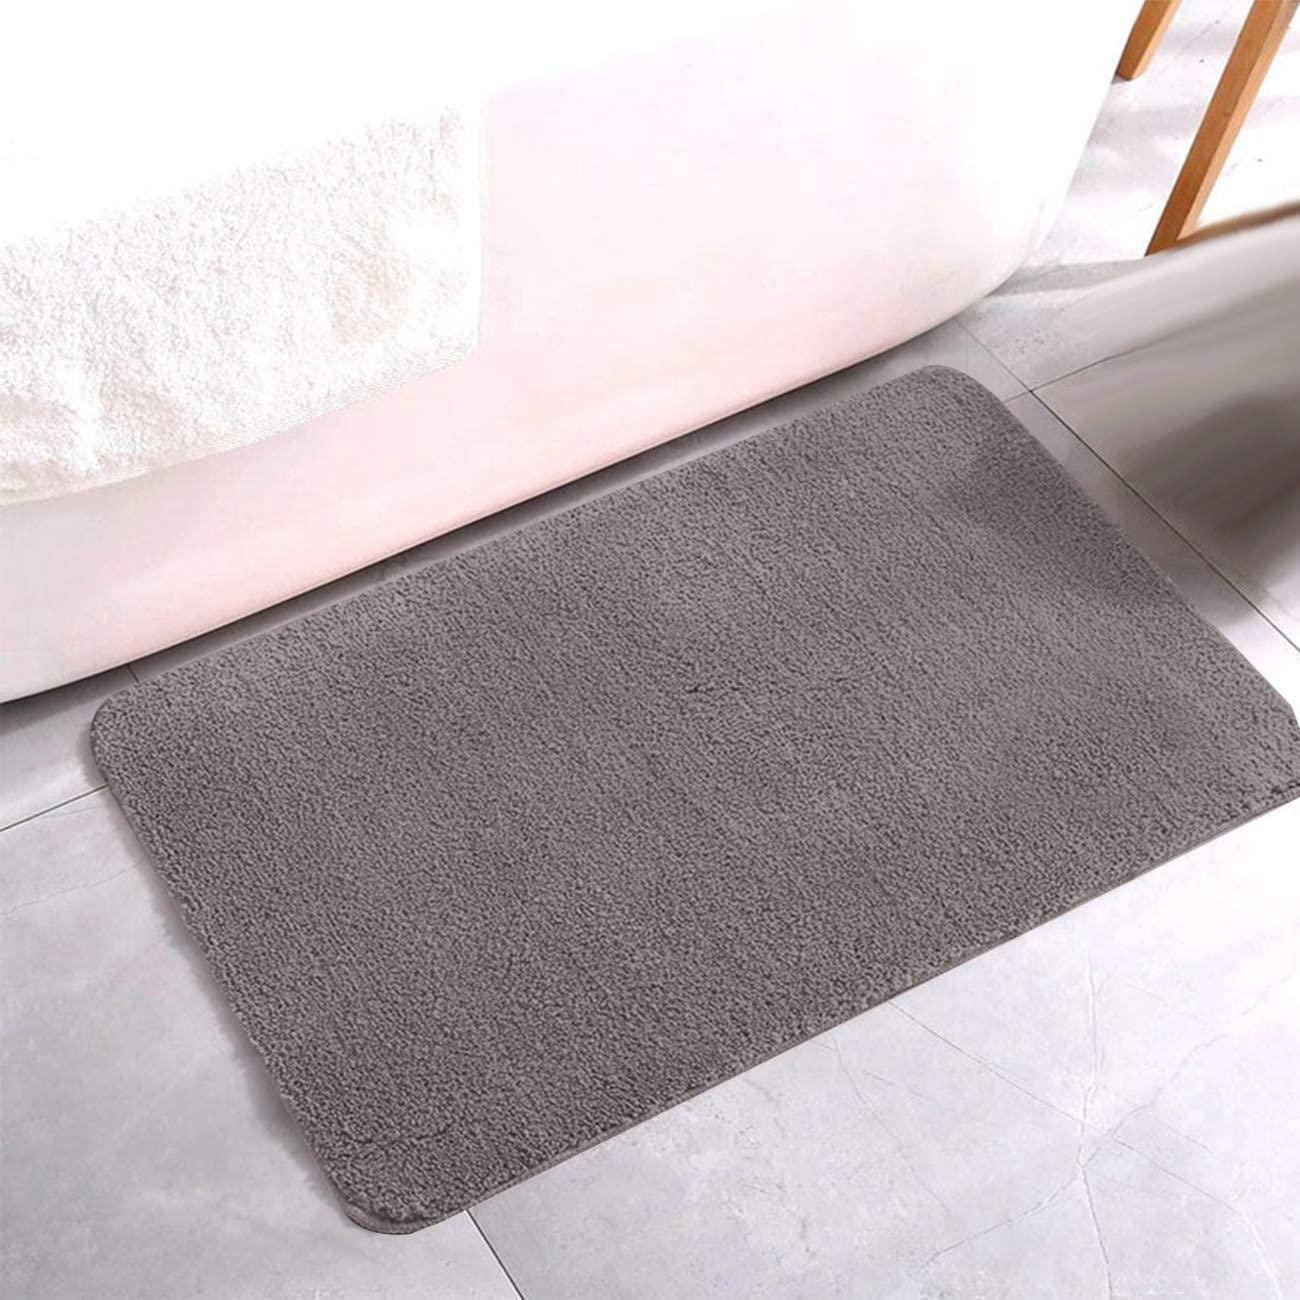 Lasten Non Slip Bath Mat, Bathroom Rug Carpet with Water Absorbent Soft Microfibers (35'' X 23'', Gray)